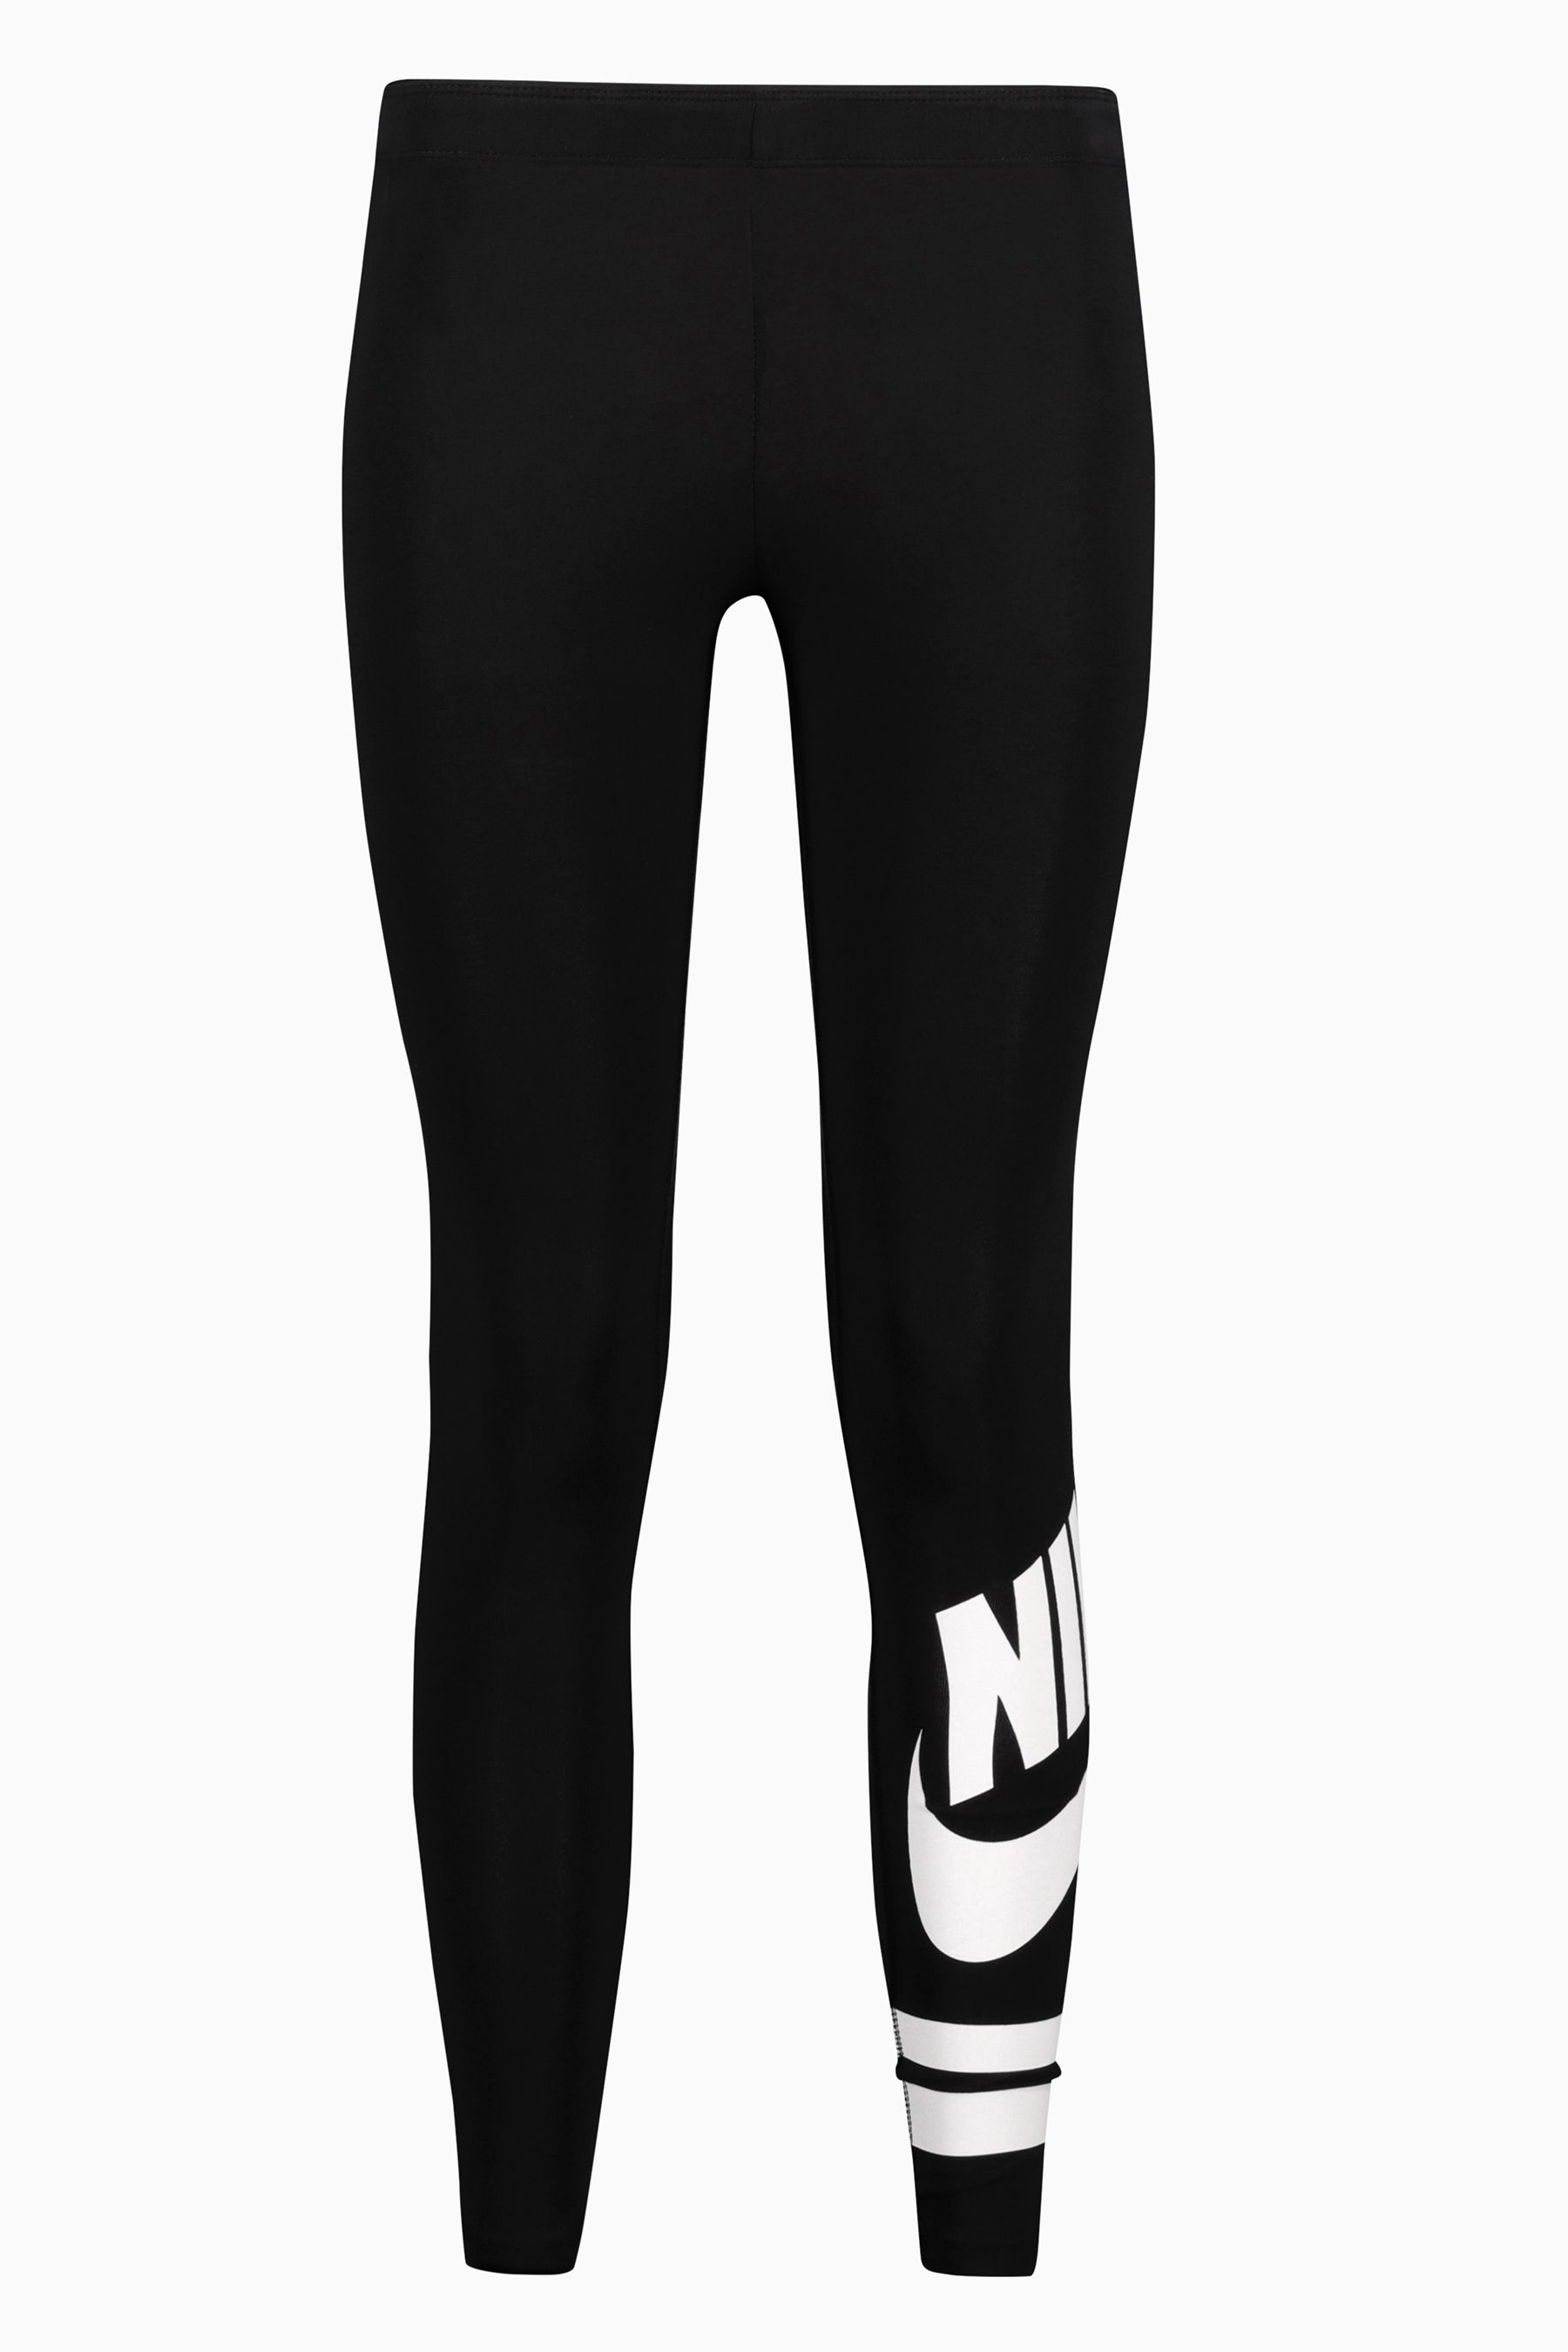 e0acb85546ac5 Girls Nike Graphic Favorite Legging - Black | Products | Trouser ...